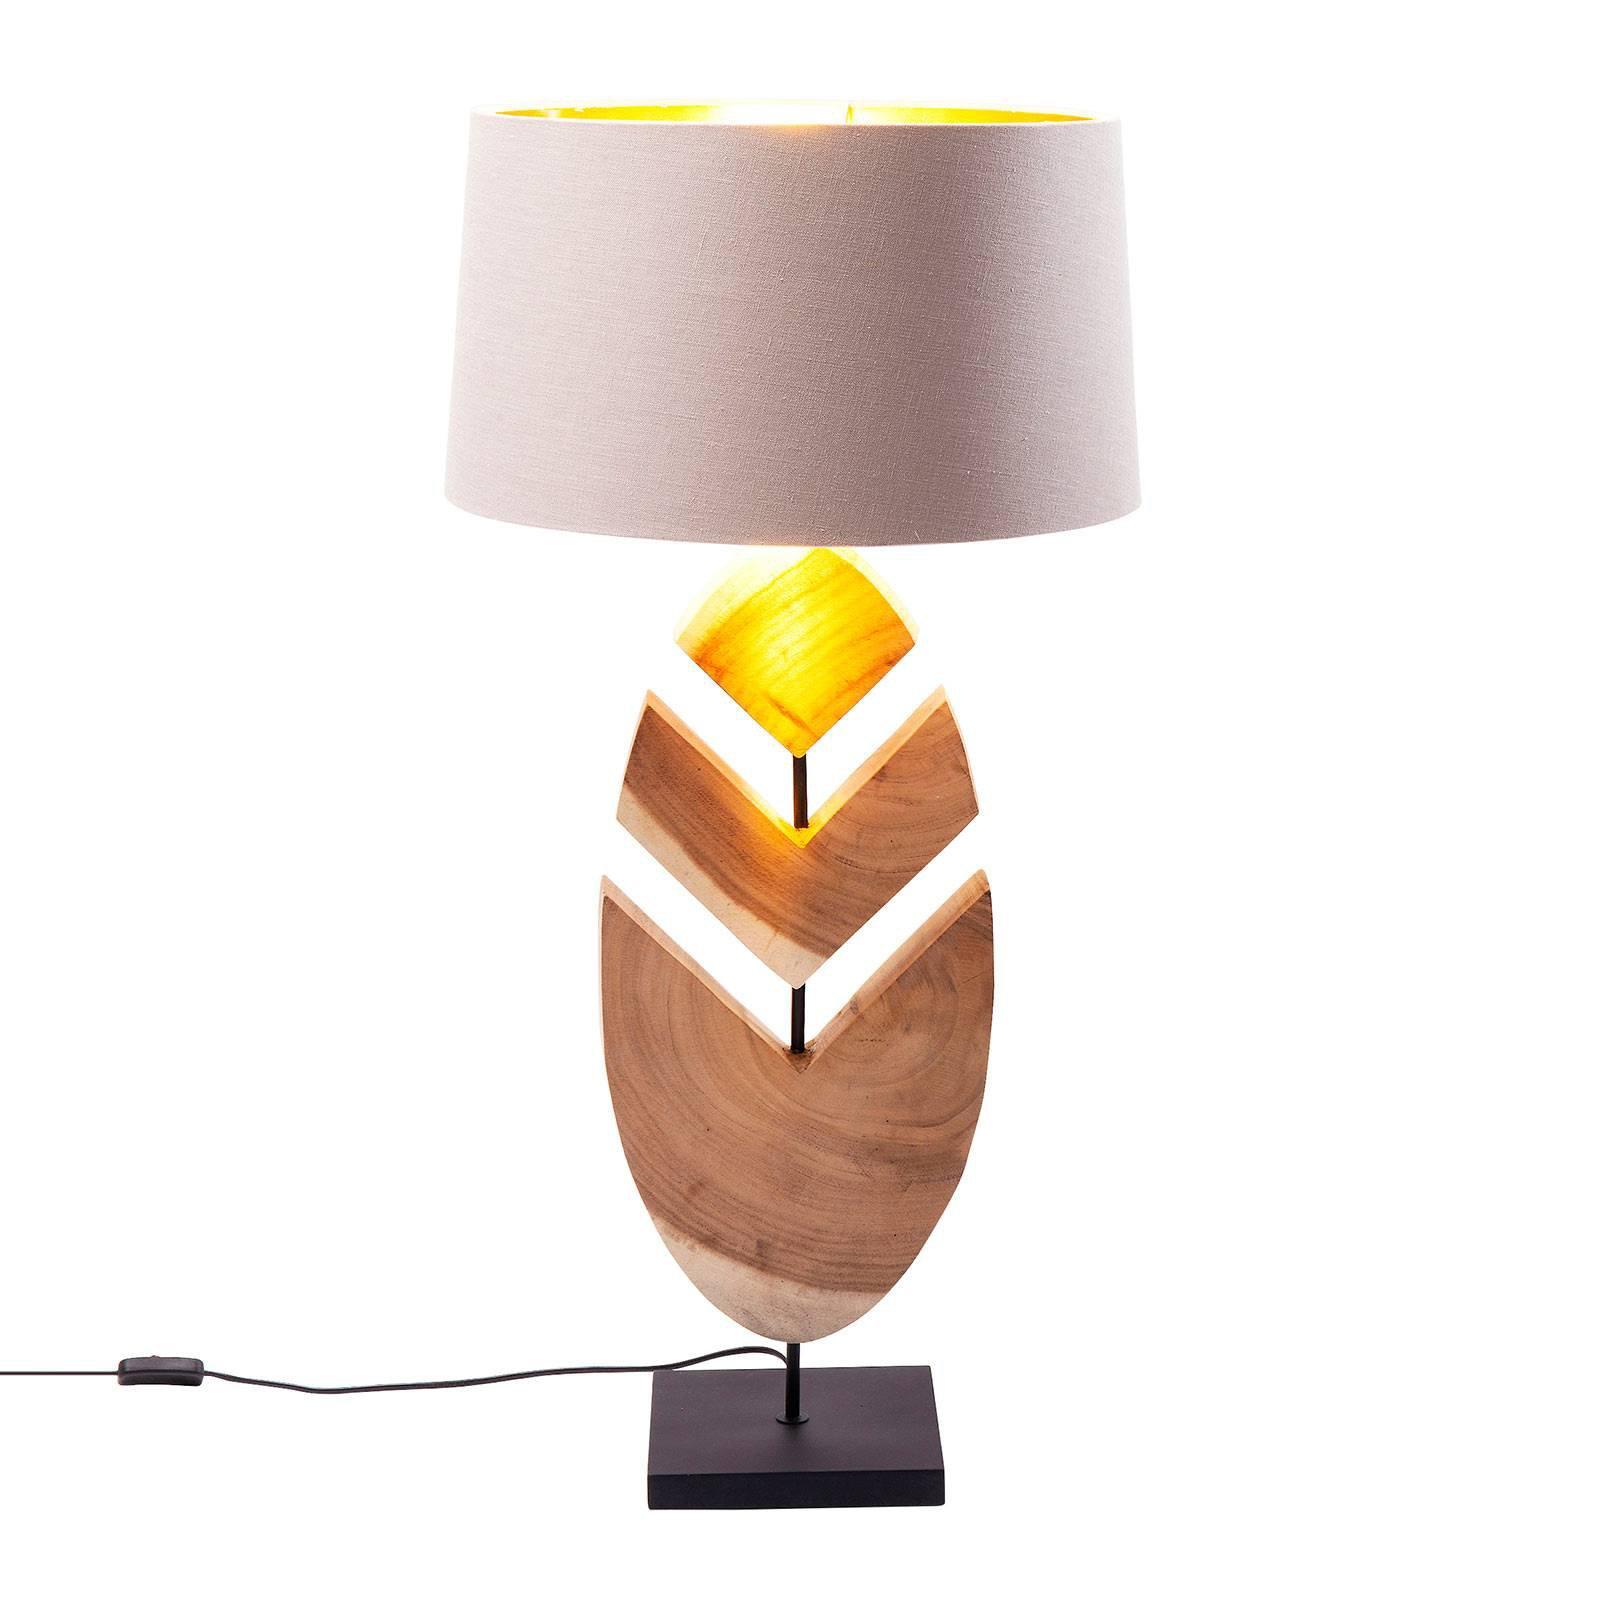 KARE Feather bordlampe med akasiatre